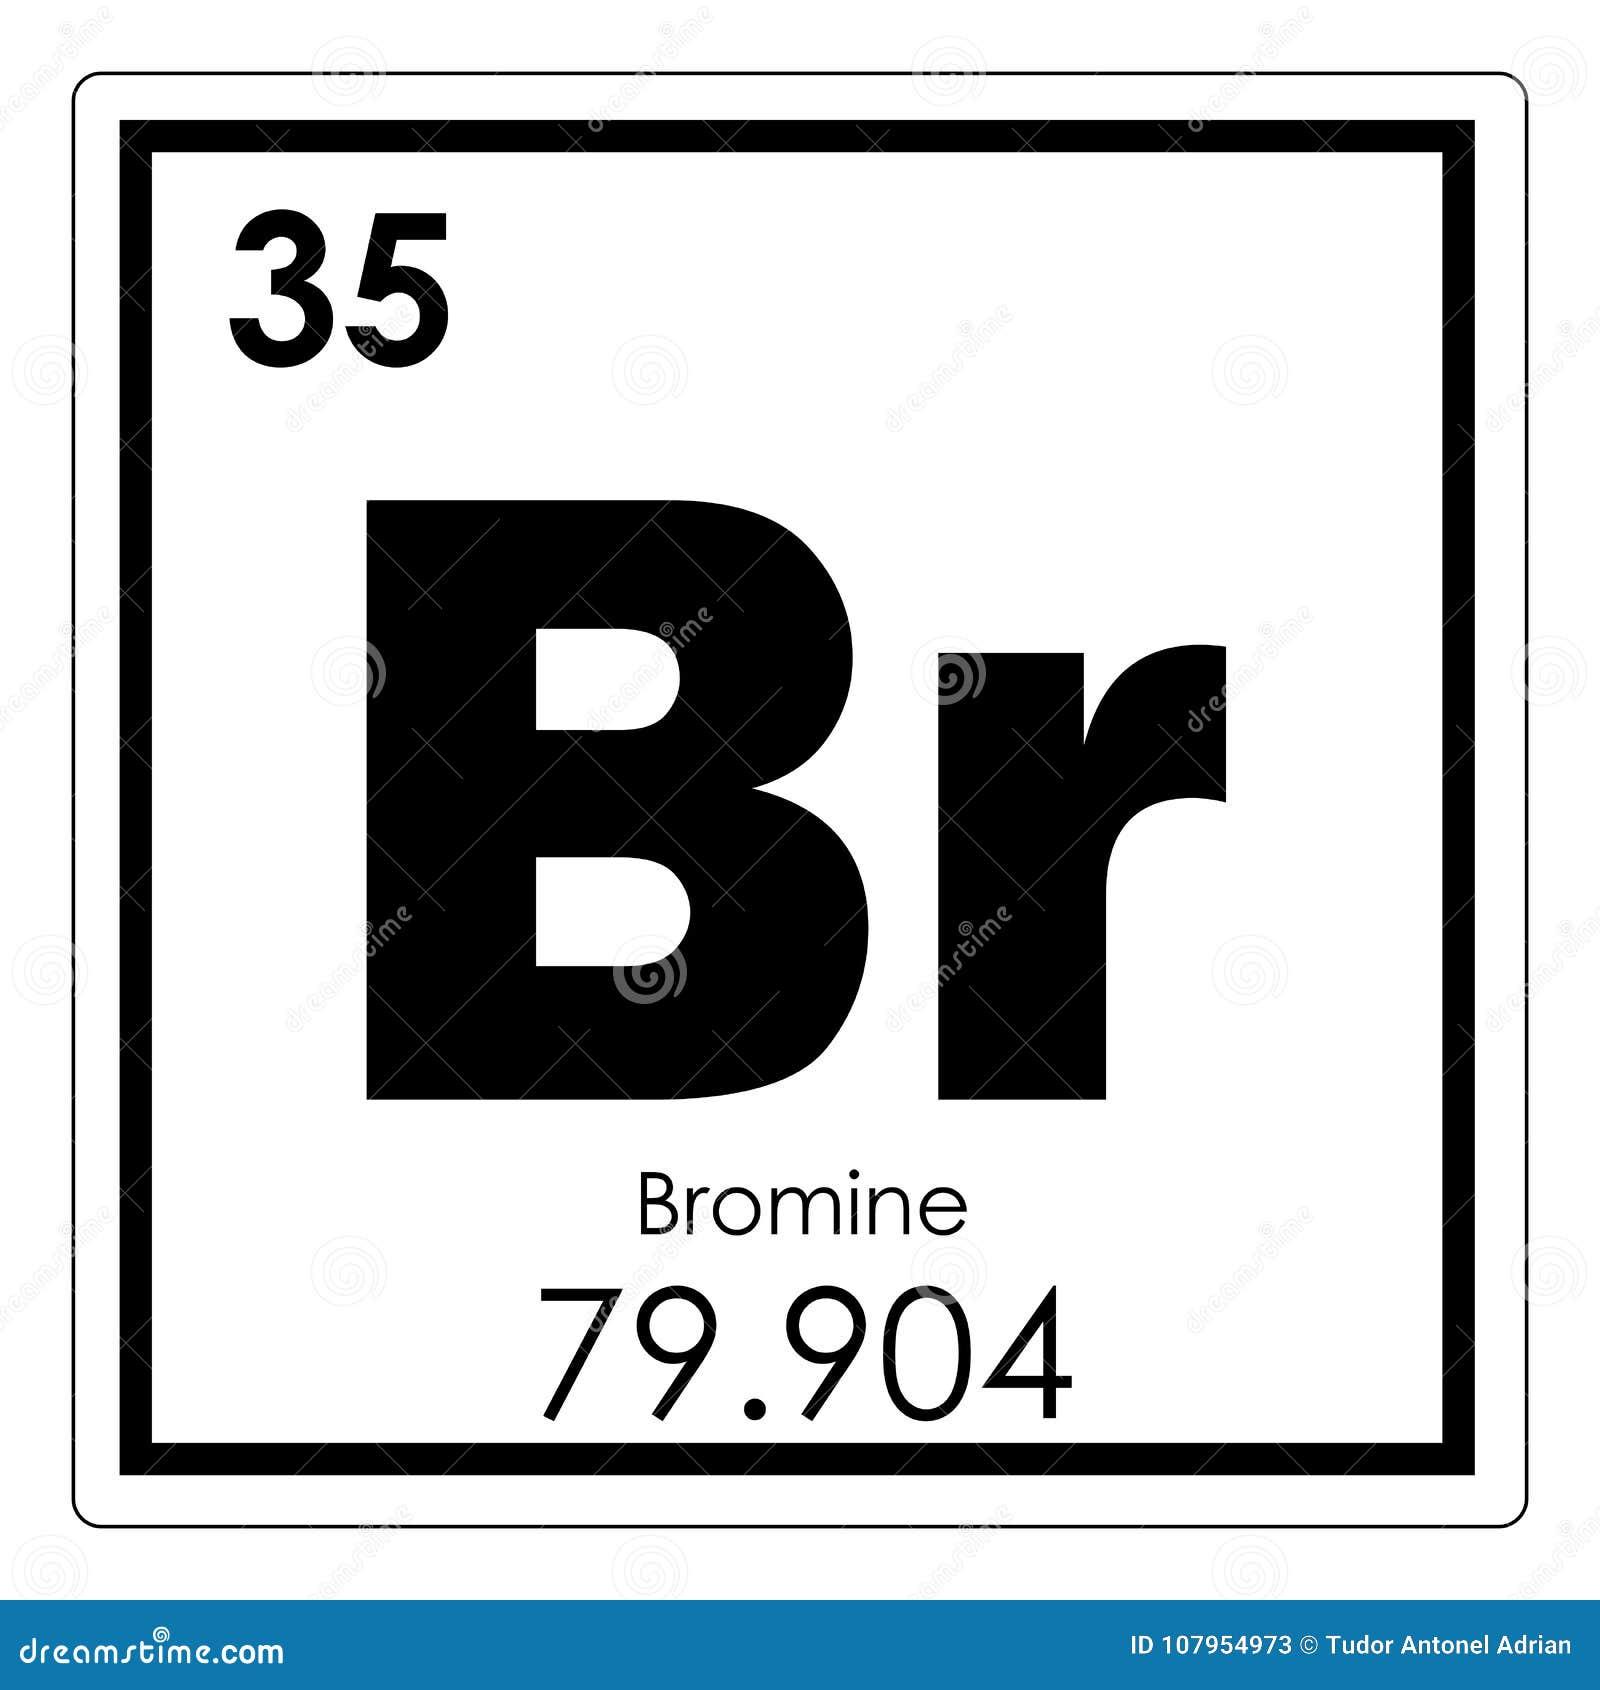 Bromine Chemical Element Stock Illustration Illustration Of Bromine